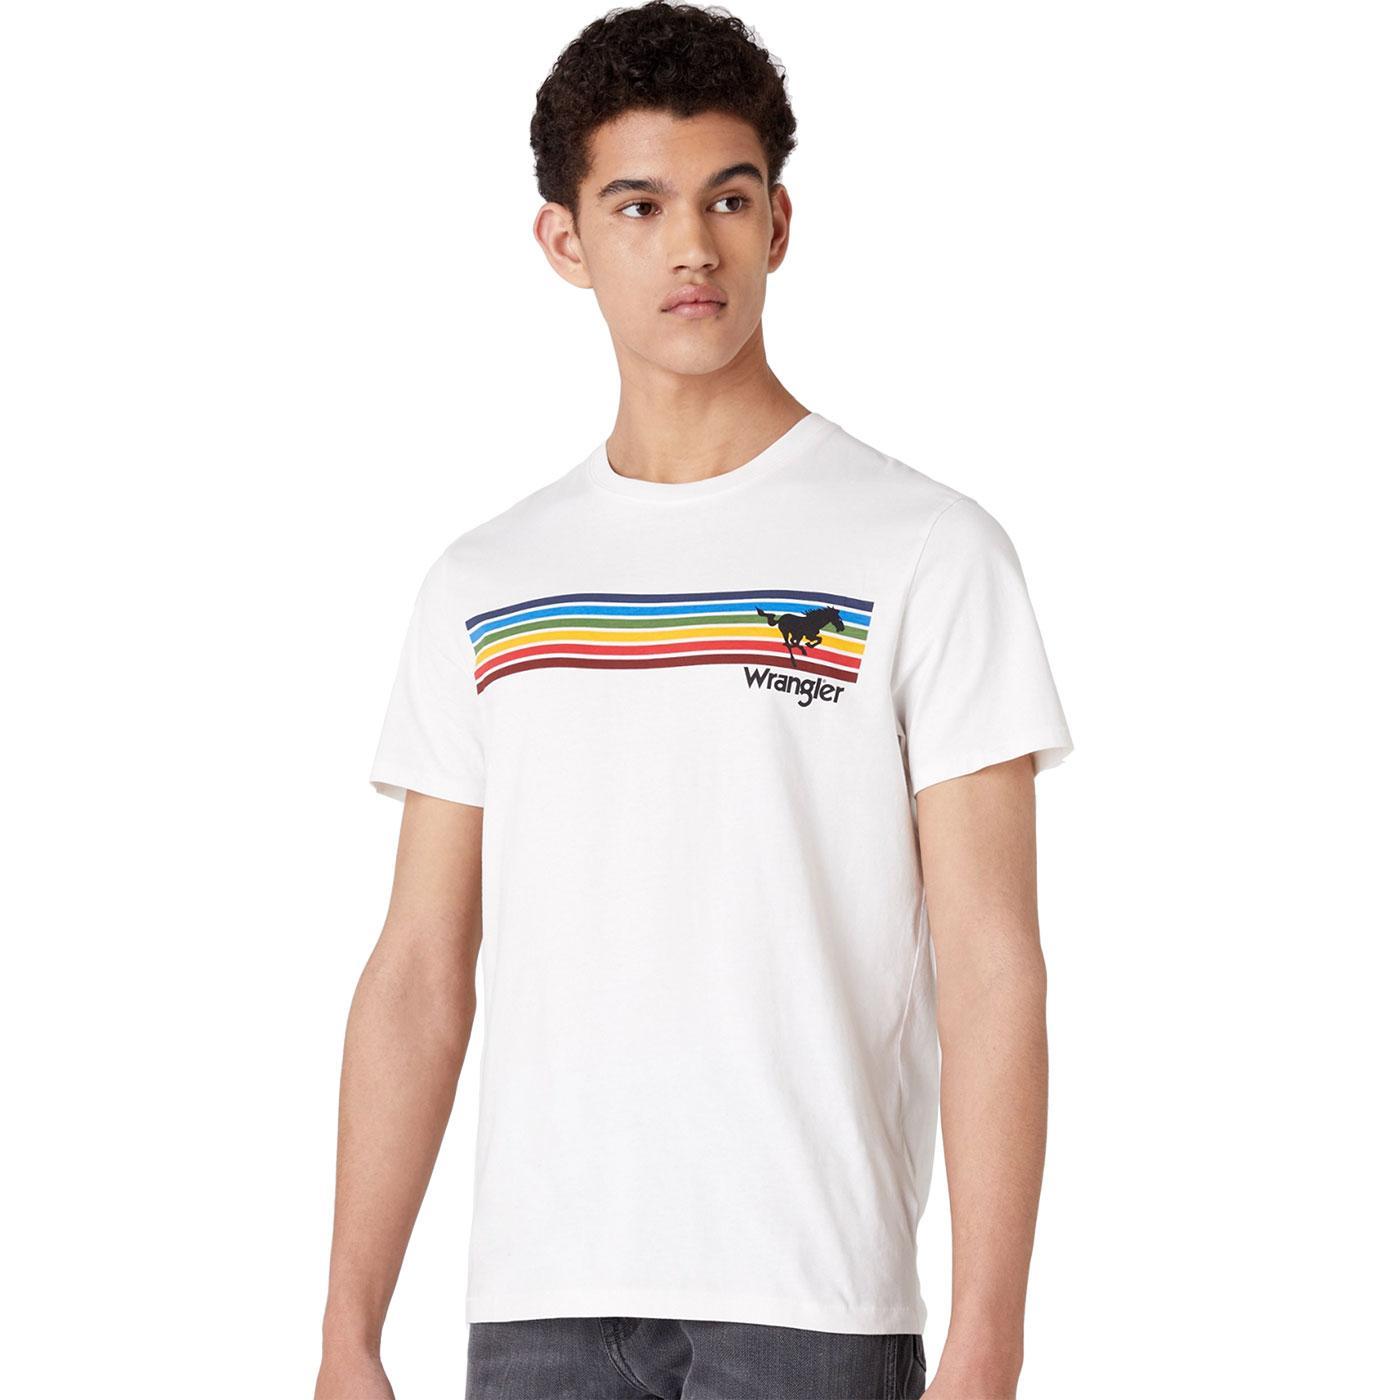 Explorer WRANGLER Retro 70s Rainbow Stripe Tee OW